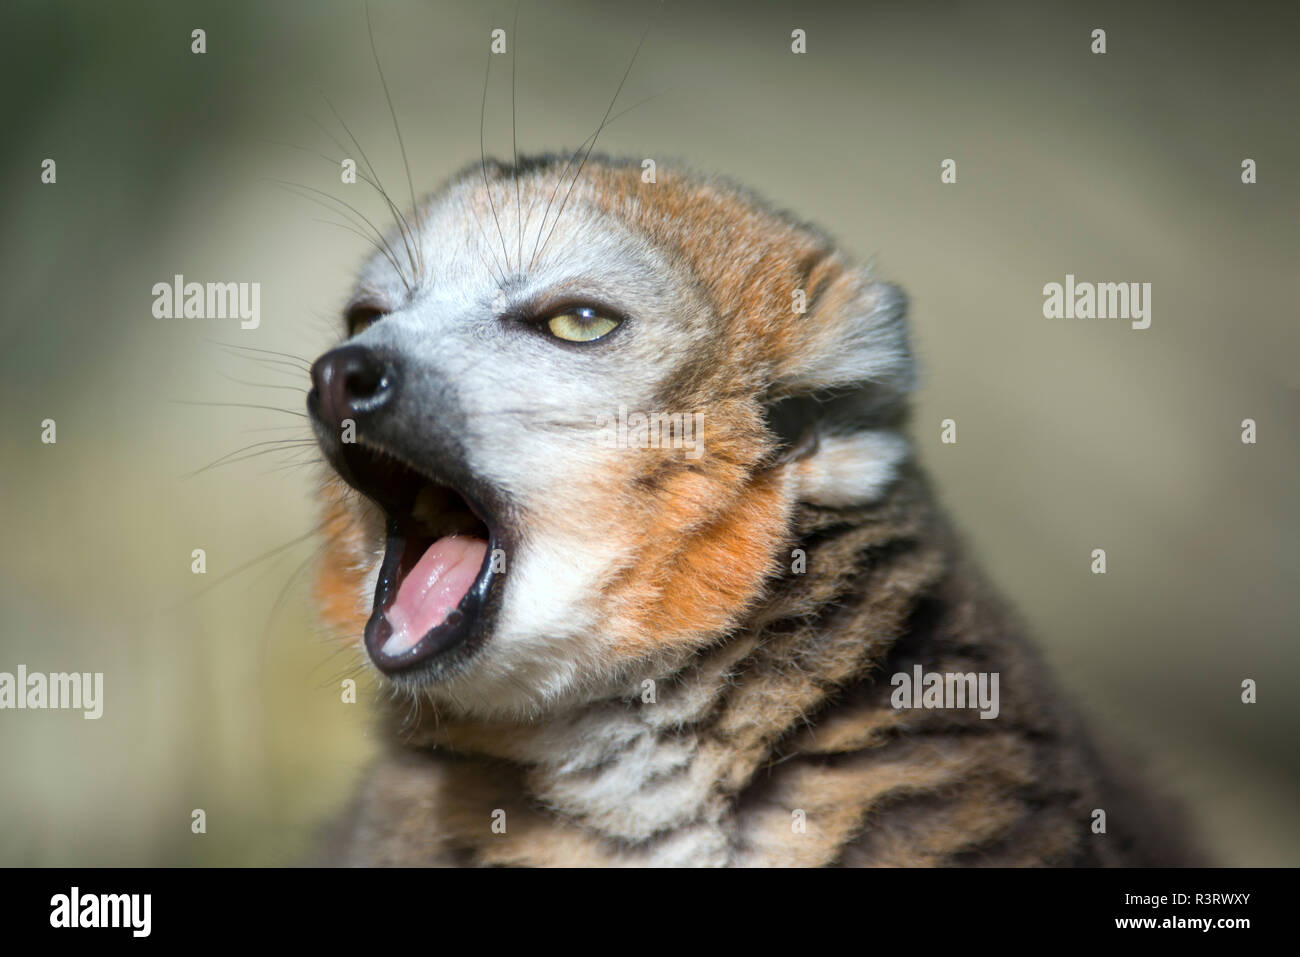 Portrait of yawning crowned lemur - Stock Image